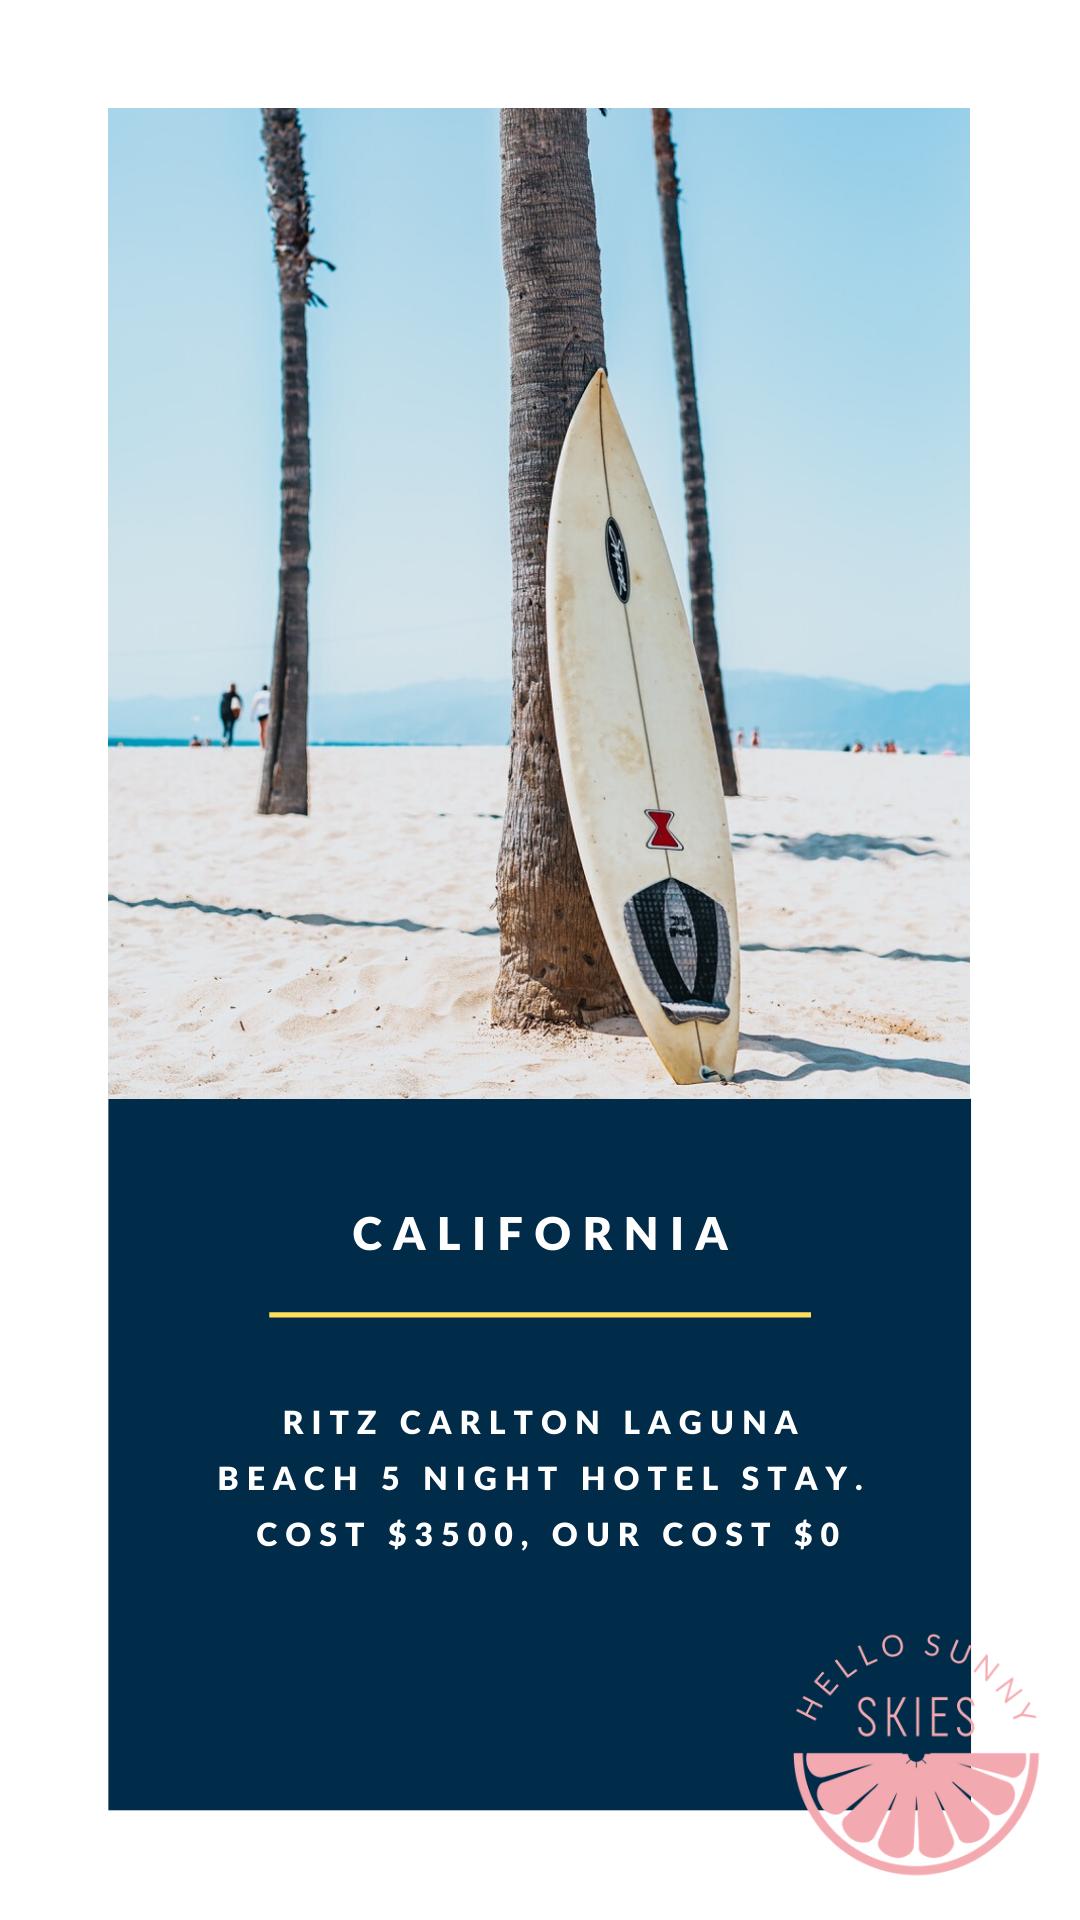 California Travel Hacked 5 Nights Free At The Ritz Carlton Laguna Free Travel Laguna Beach Free Travel Ritz Carlton Laguna